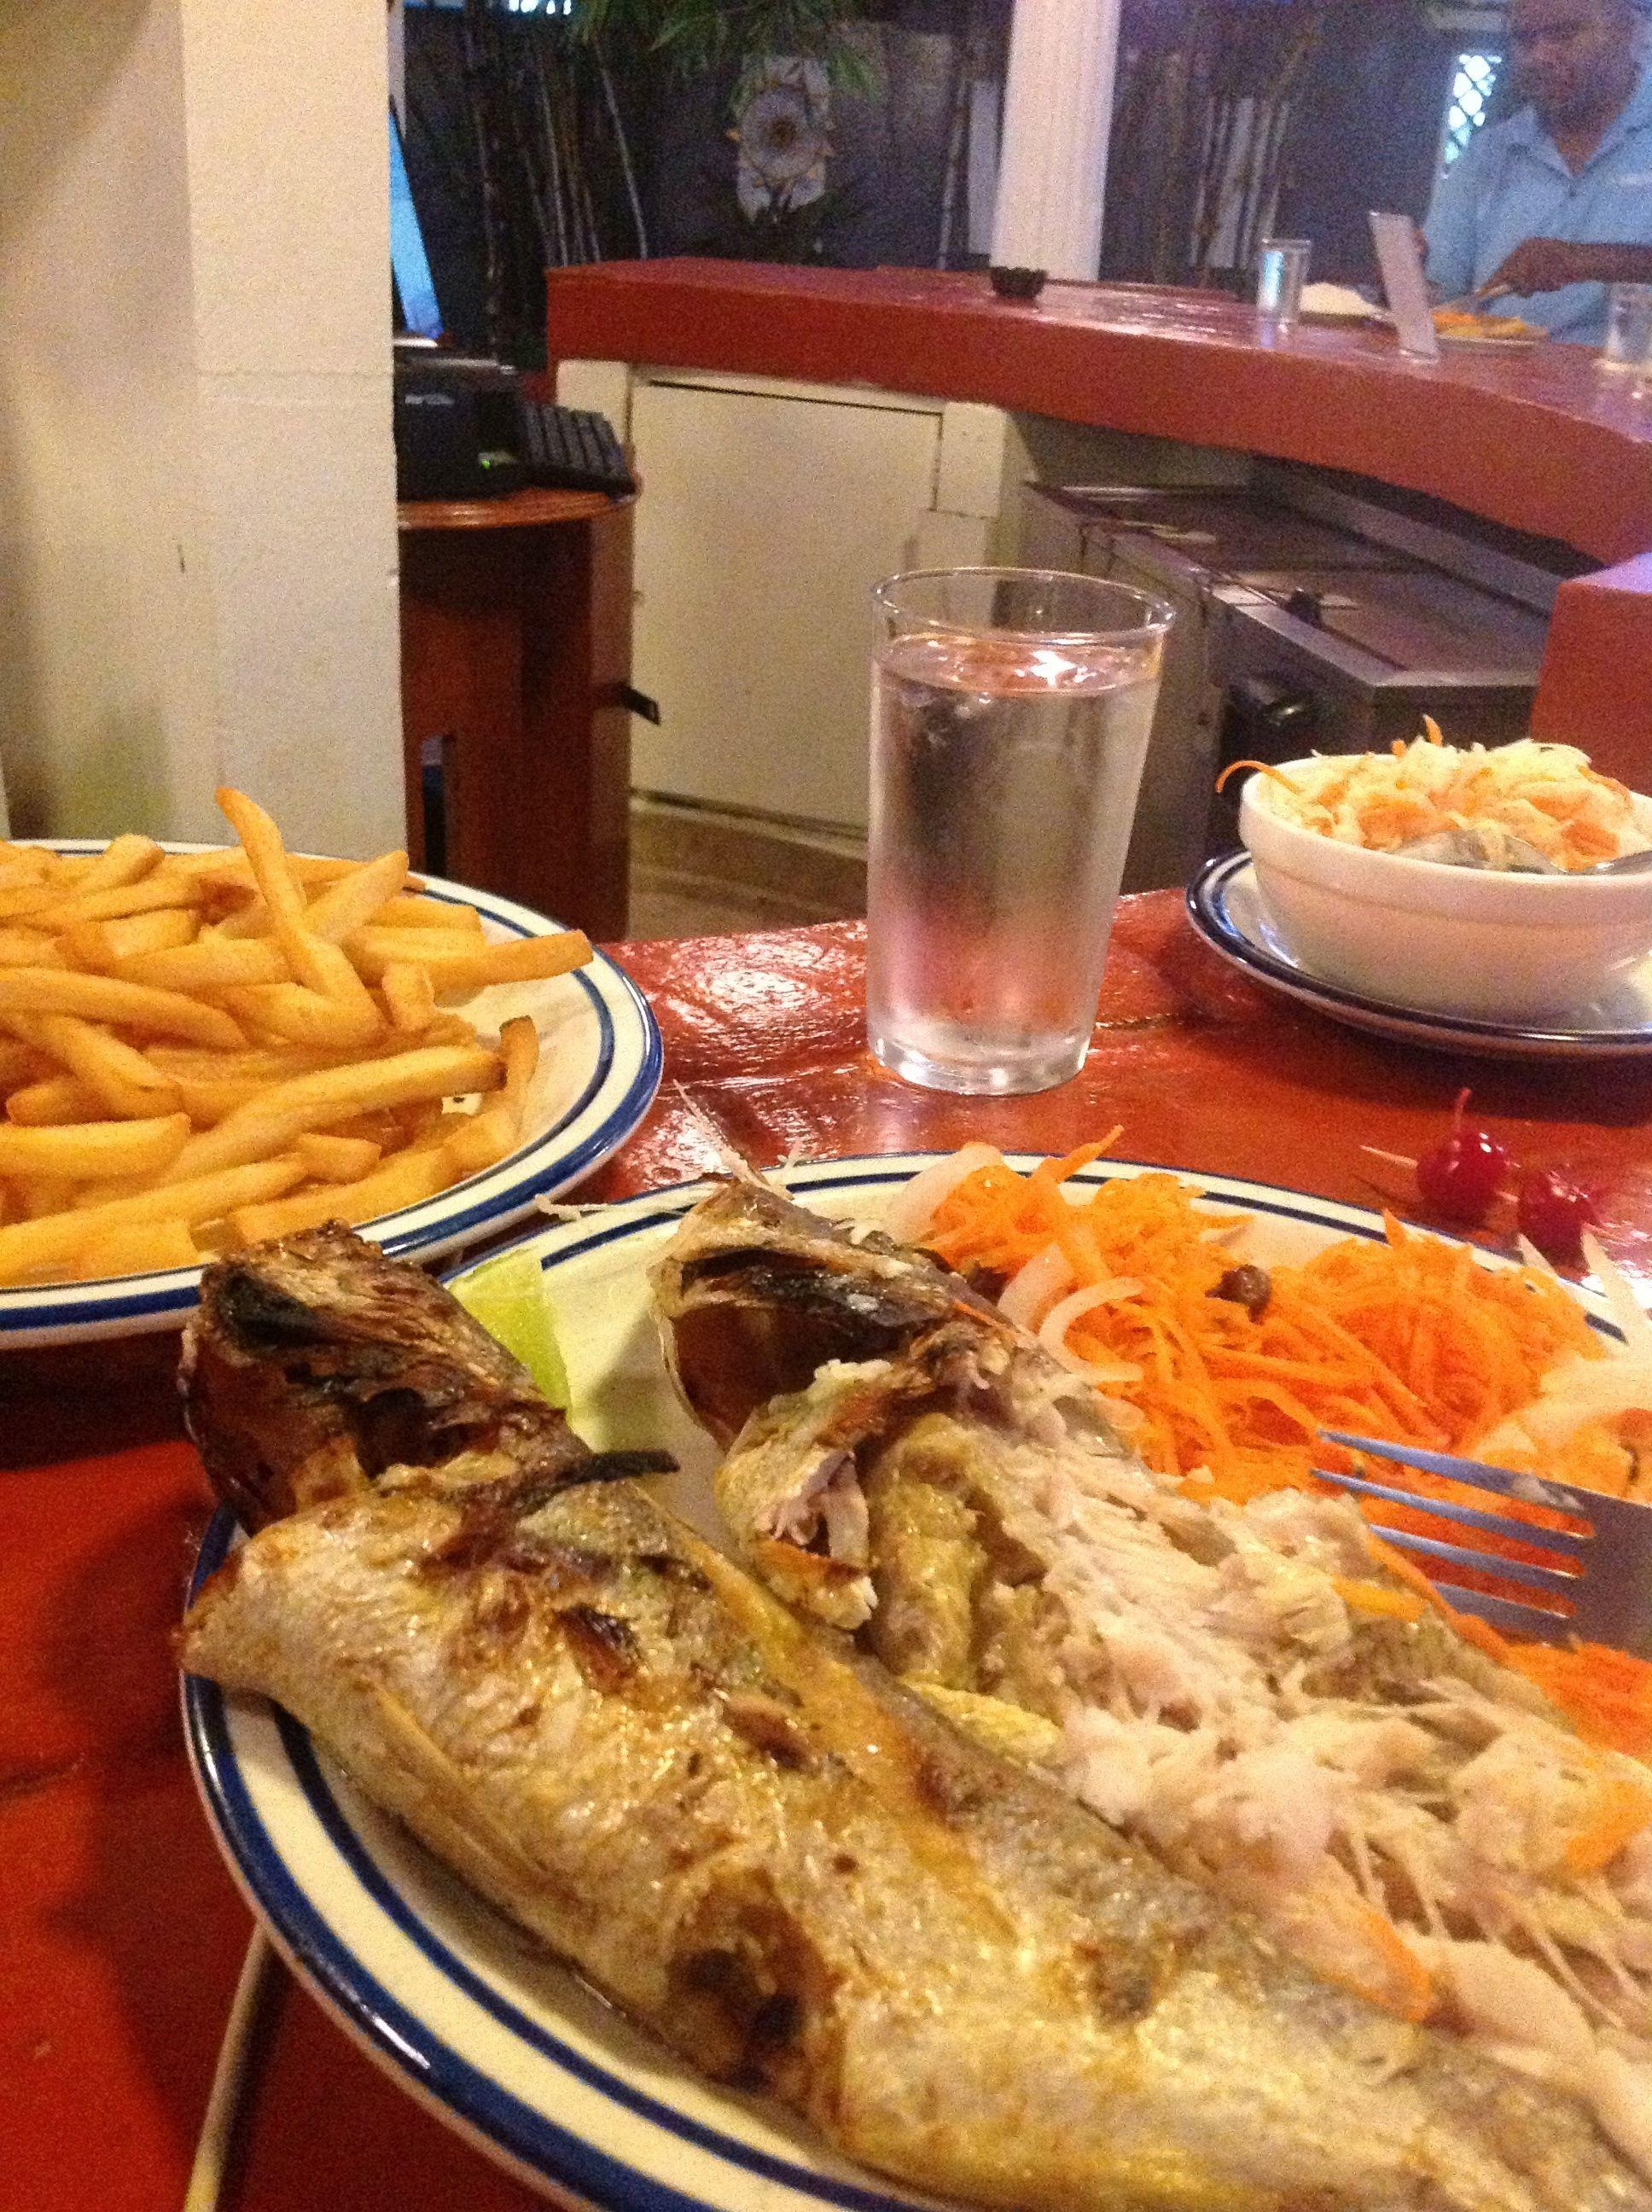 Fish, fries and salad.